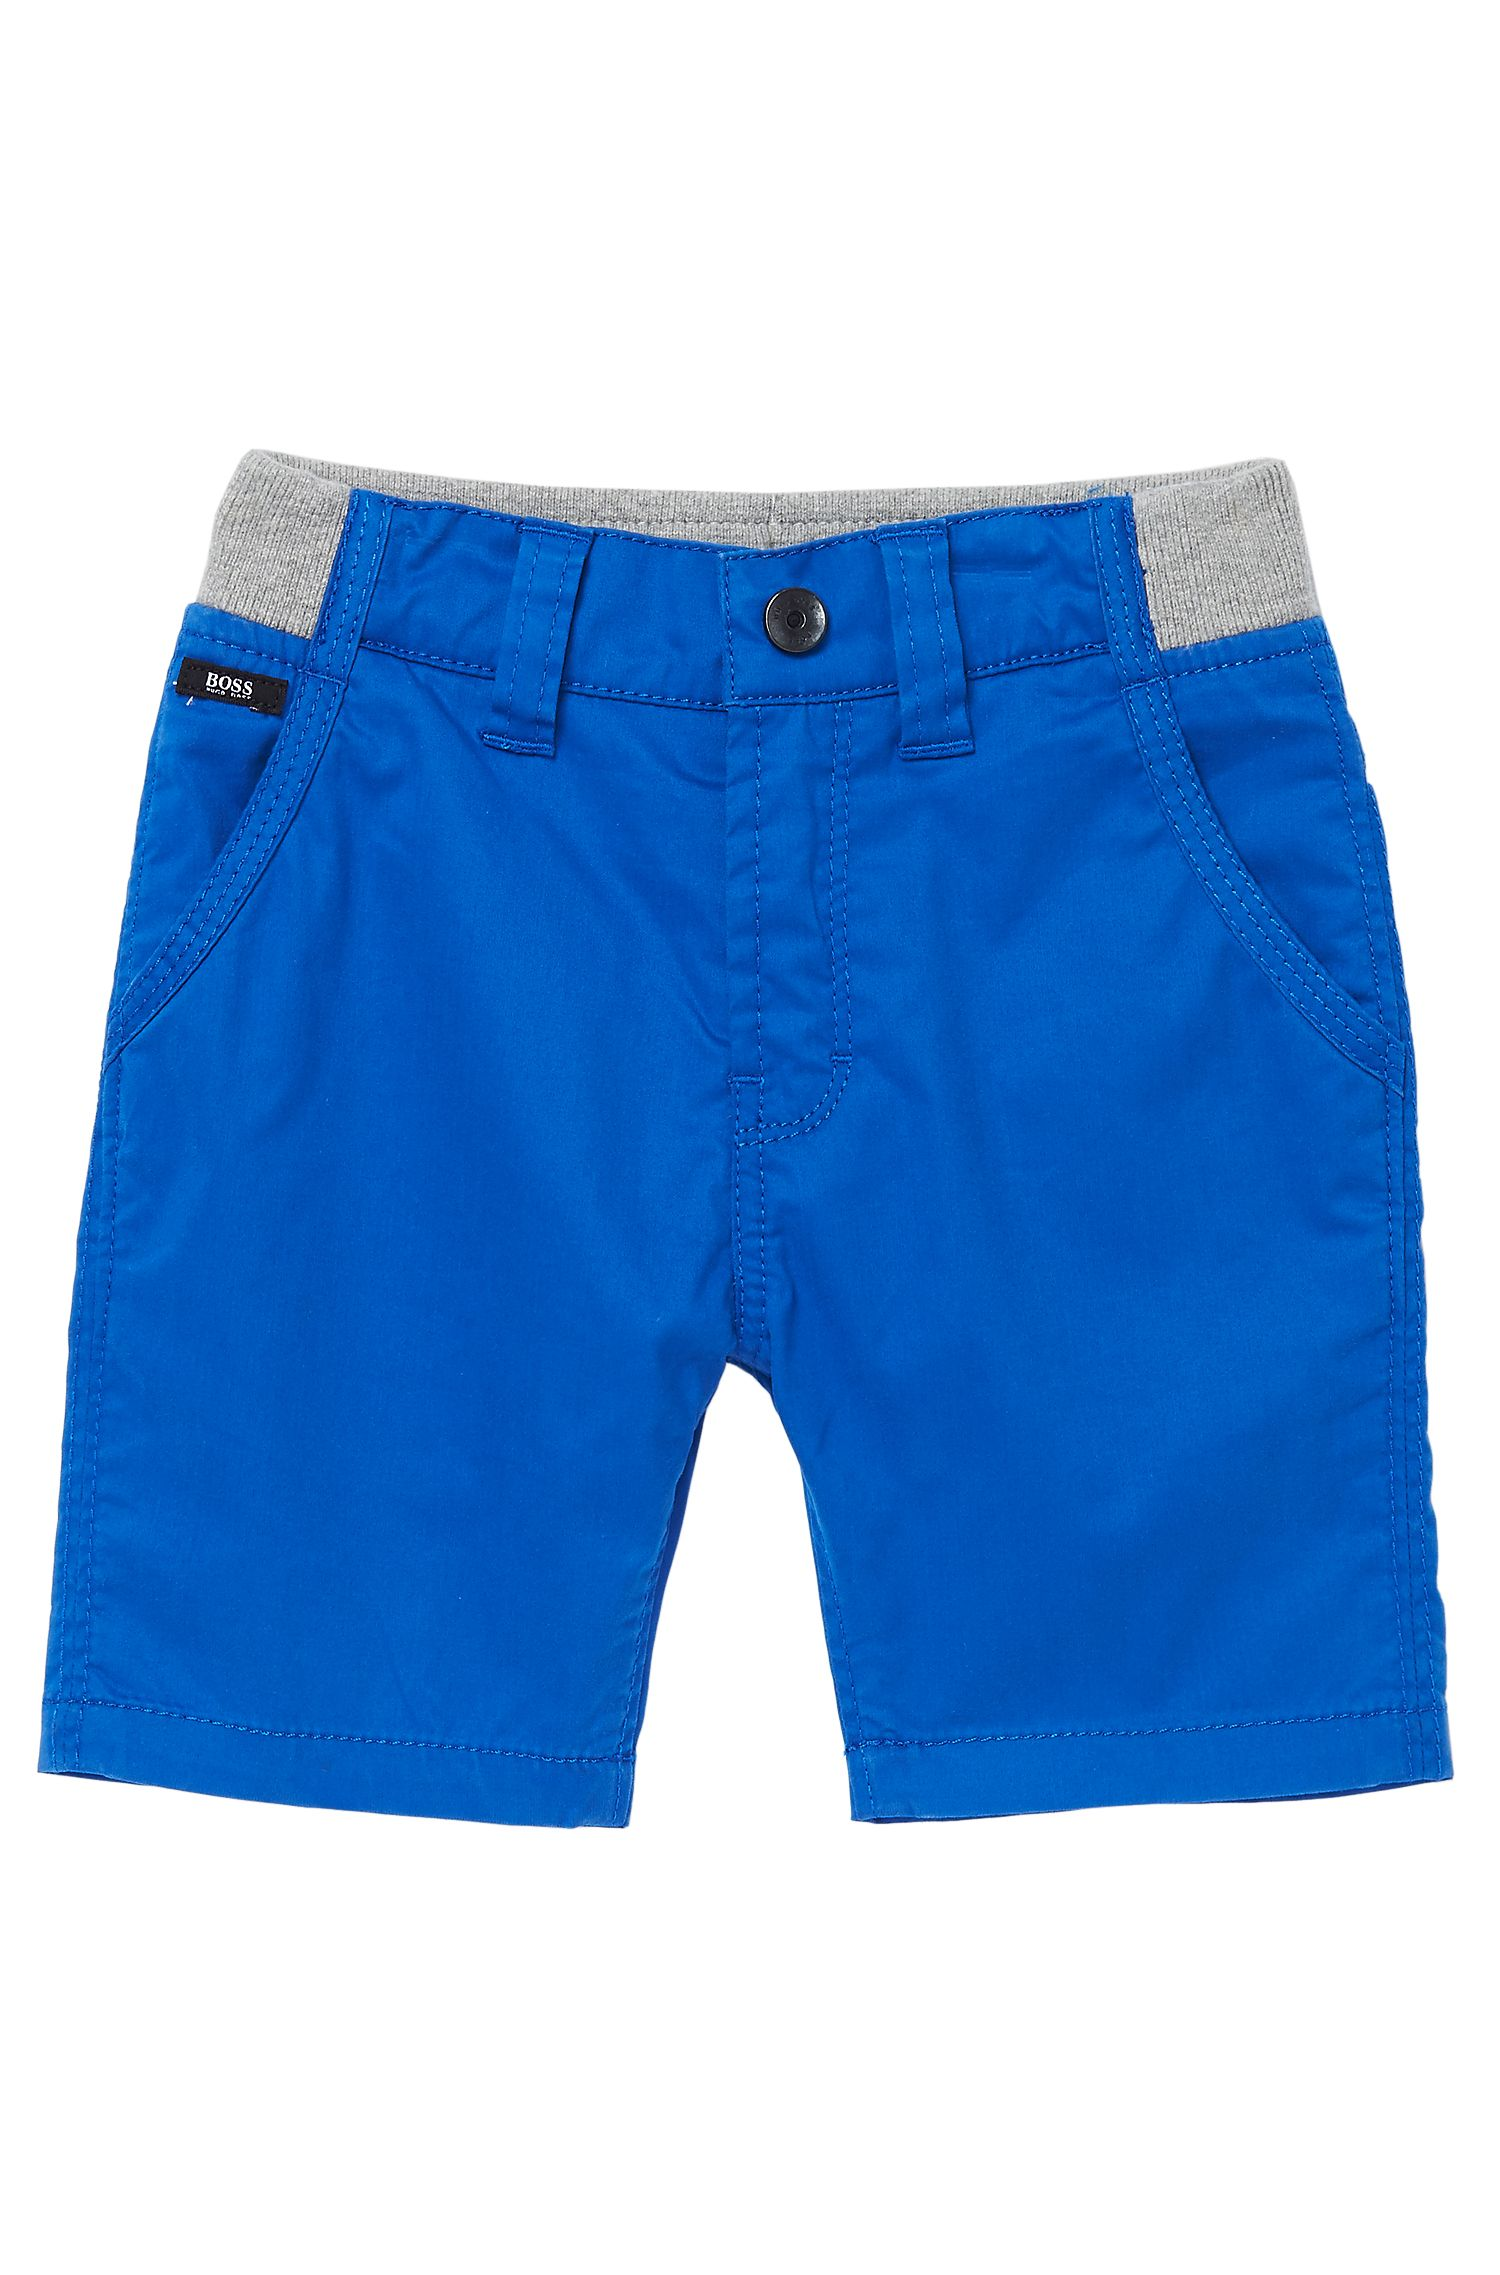 'J04146'   Toddler Cotton Twill Bermuda Shorts